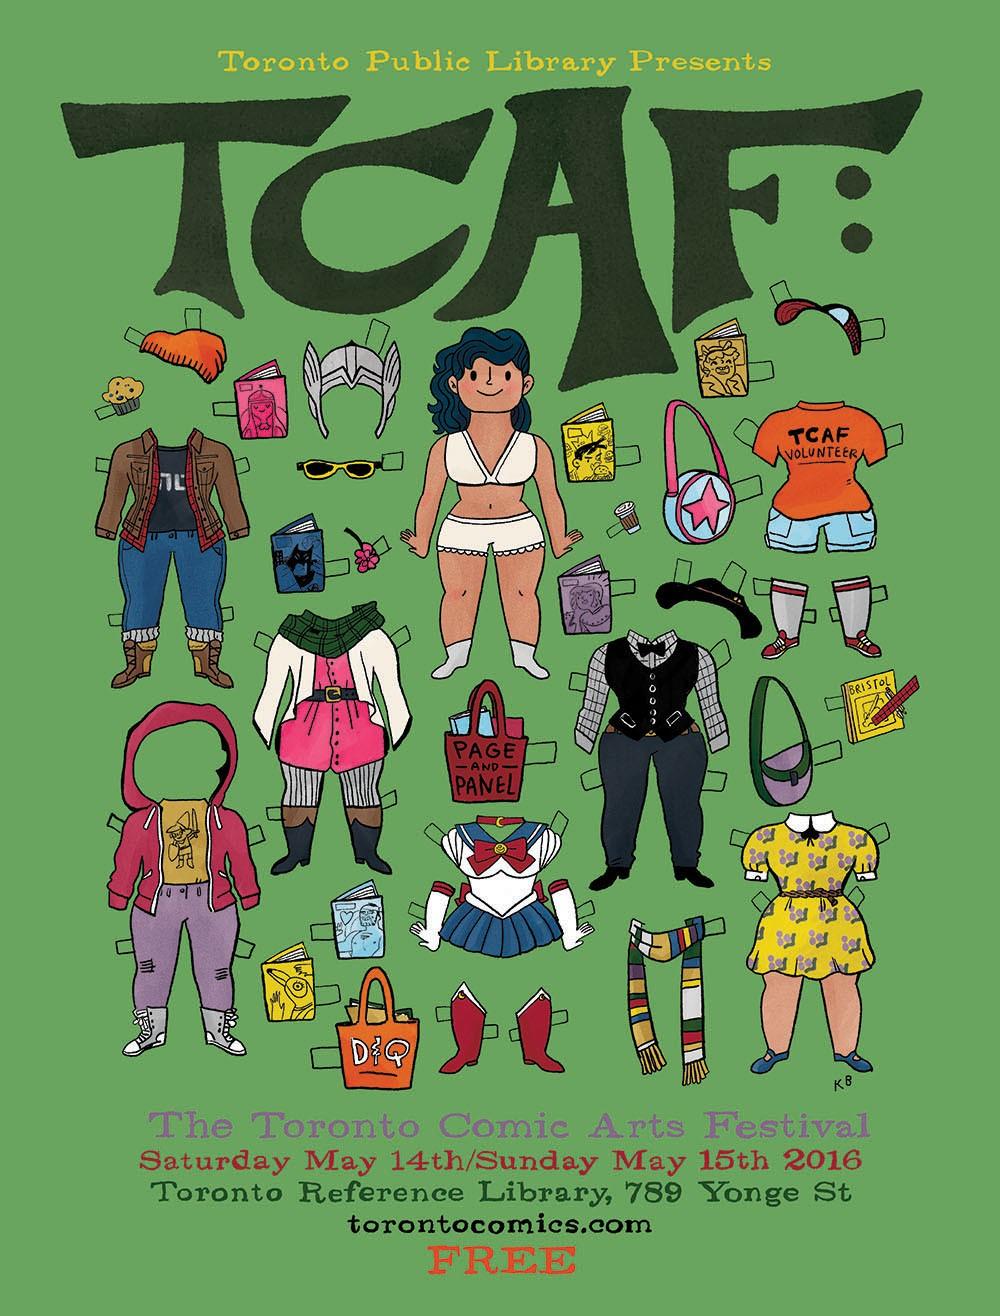 Os cartazes do Toronto Comic Arts Festival 2016, por Kate Beaton e Kazu Kibuishi